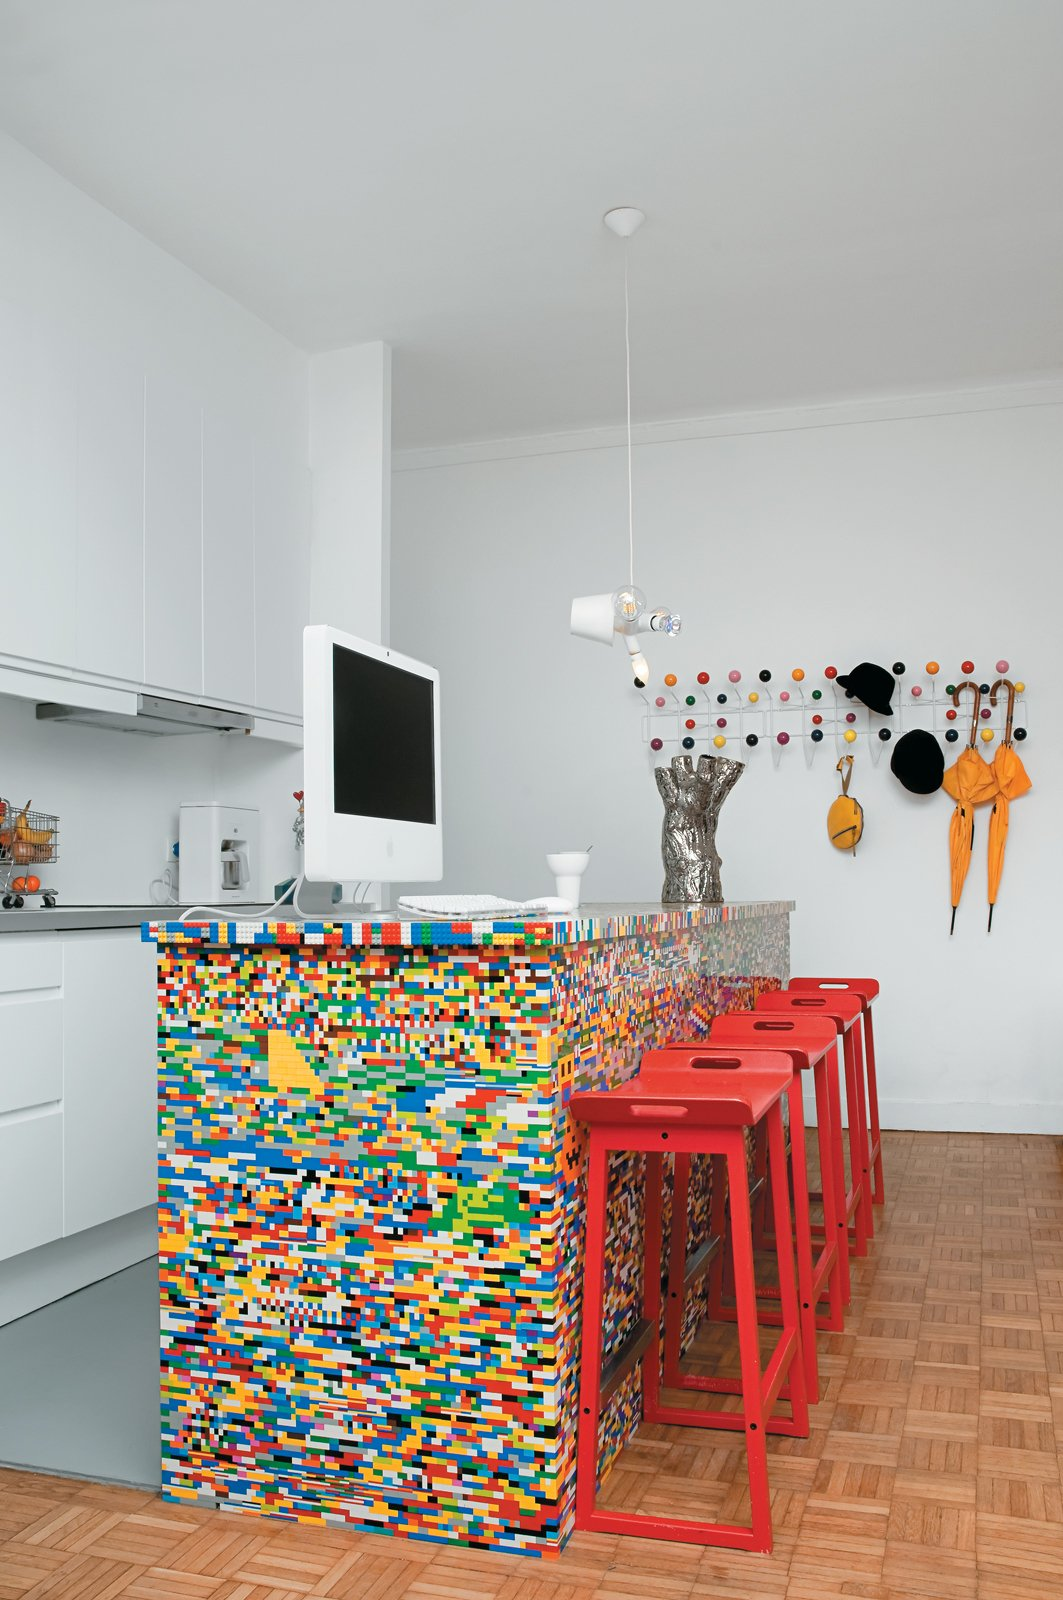 #interior #design #interiordesign #modern #kitchen #legos #color #colorful #redchairs #countertop #counter #stool #desk #coathanger #paris #philipperossetti #simonpillard #munchausen #kitchenisland   36+ Interior Color Pop Ideas For Modern Homes